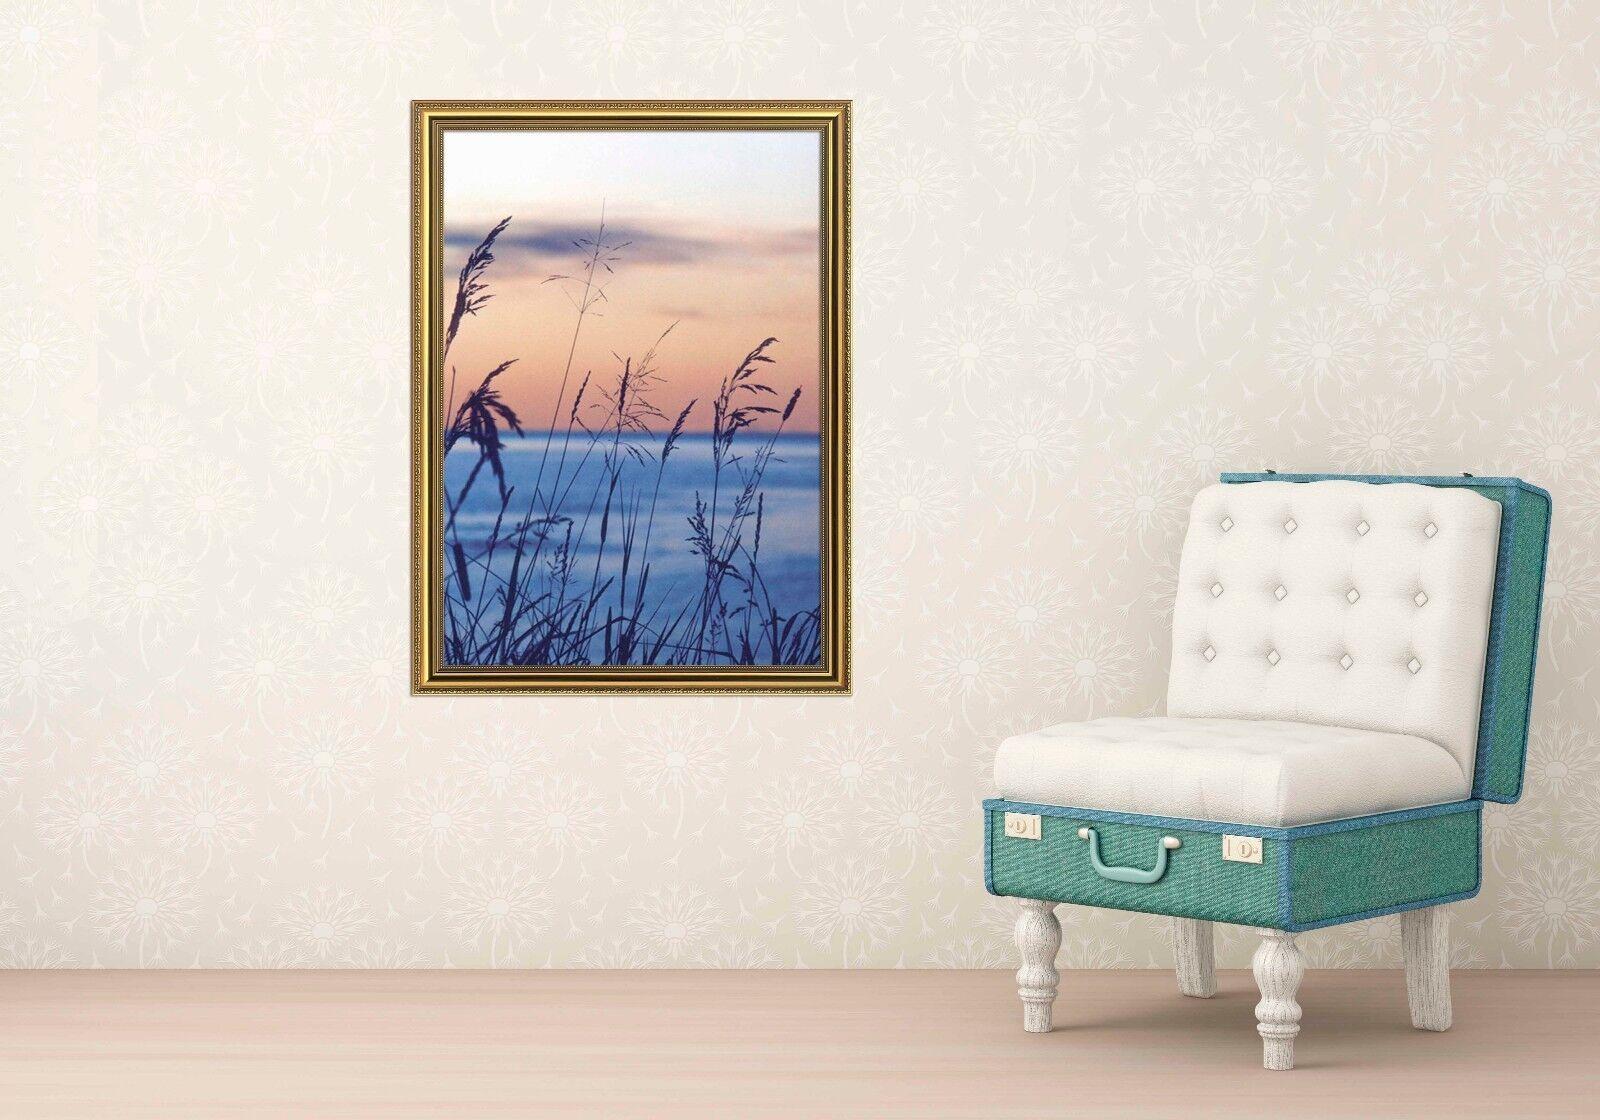 3D Riverside Grass 6 Framed Poster Home Decor Print Painting Art AJ AU